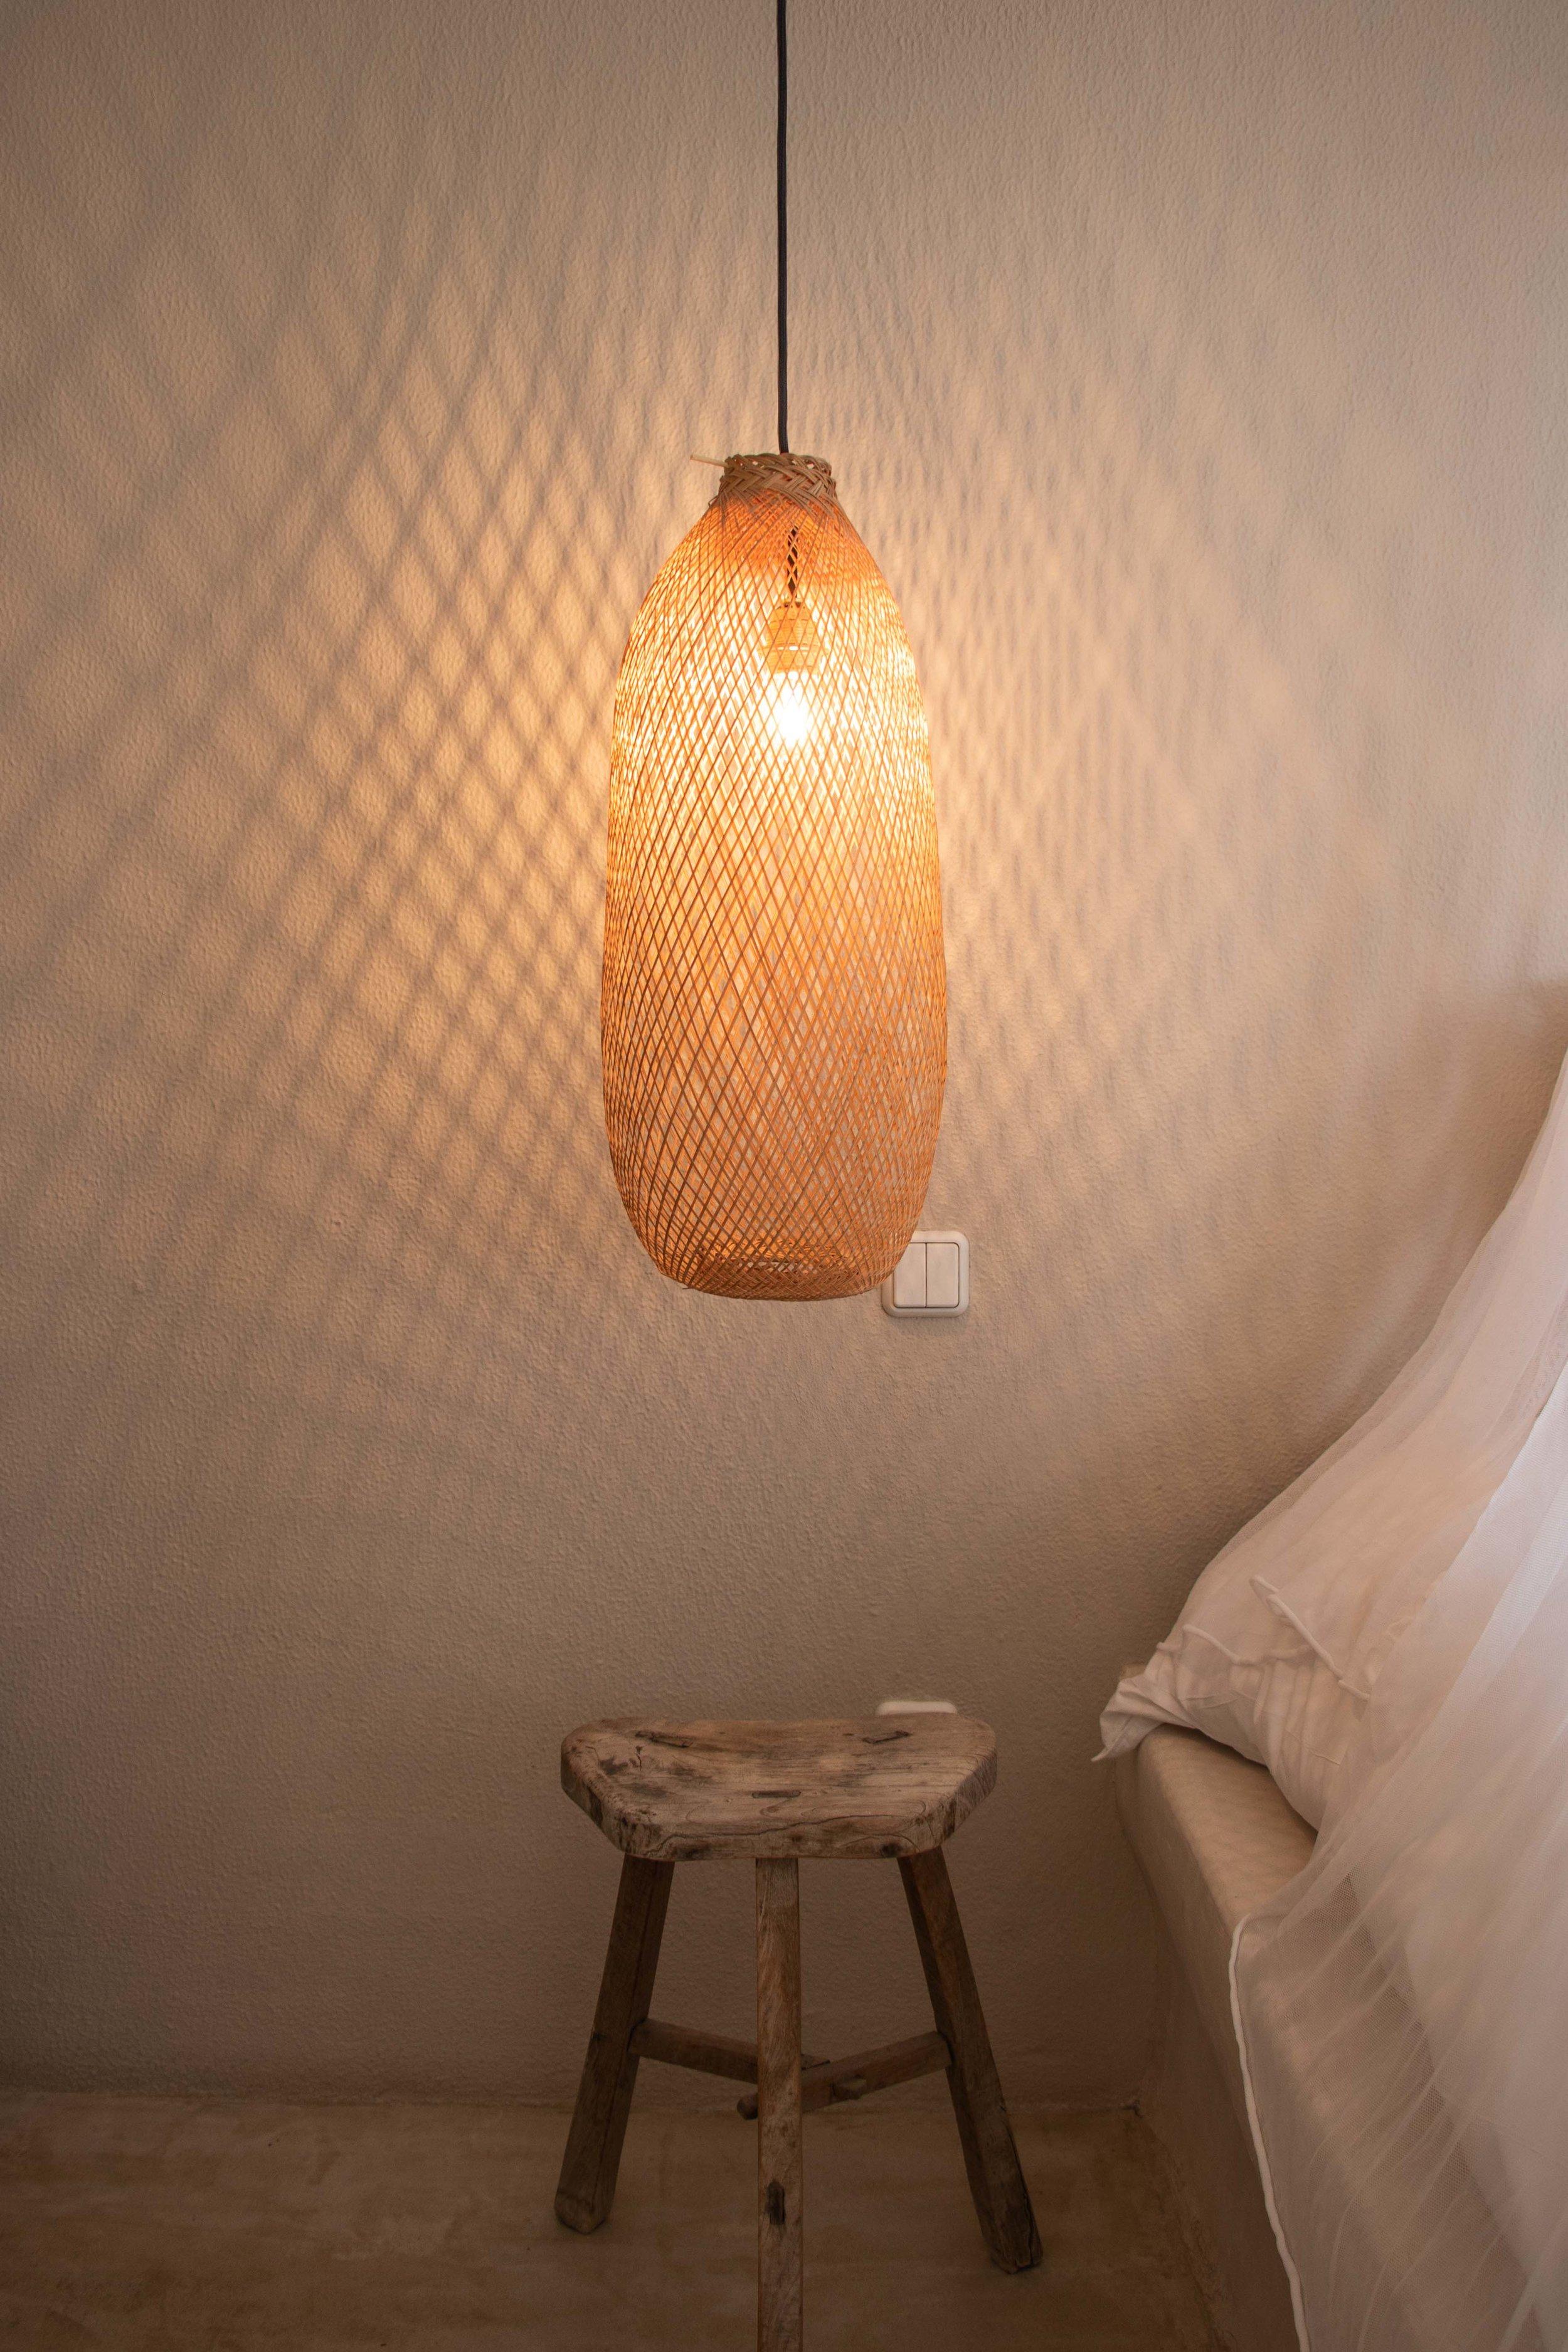 San Giorgrio - Room Lighting